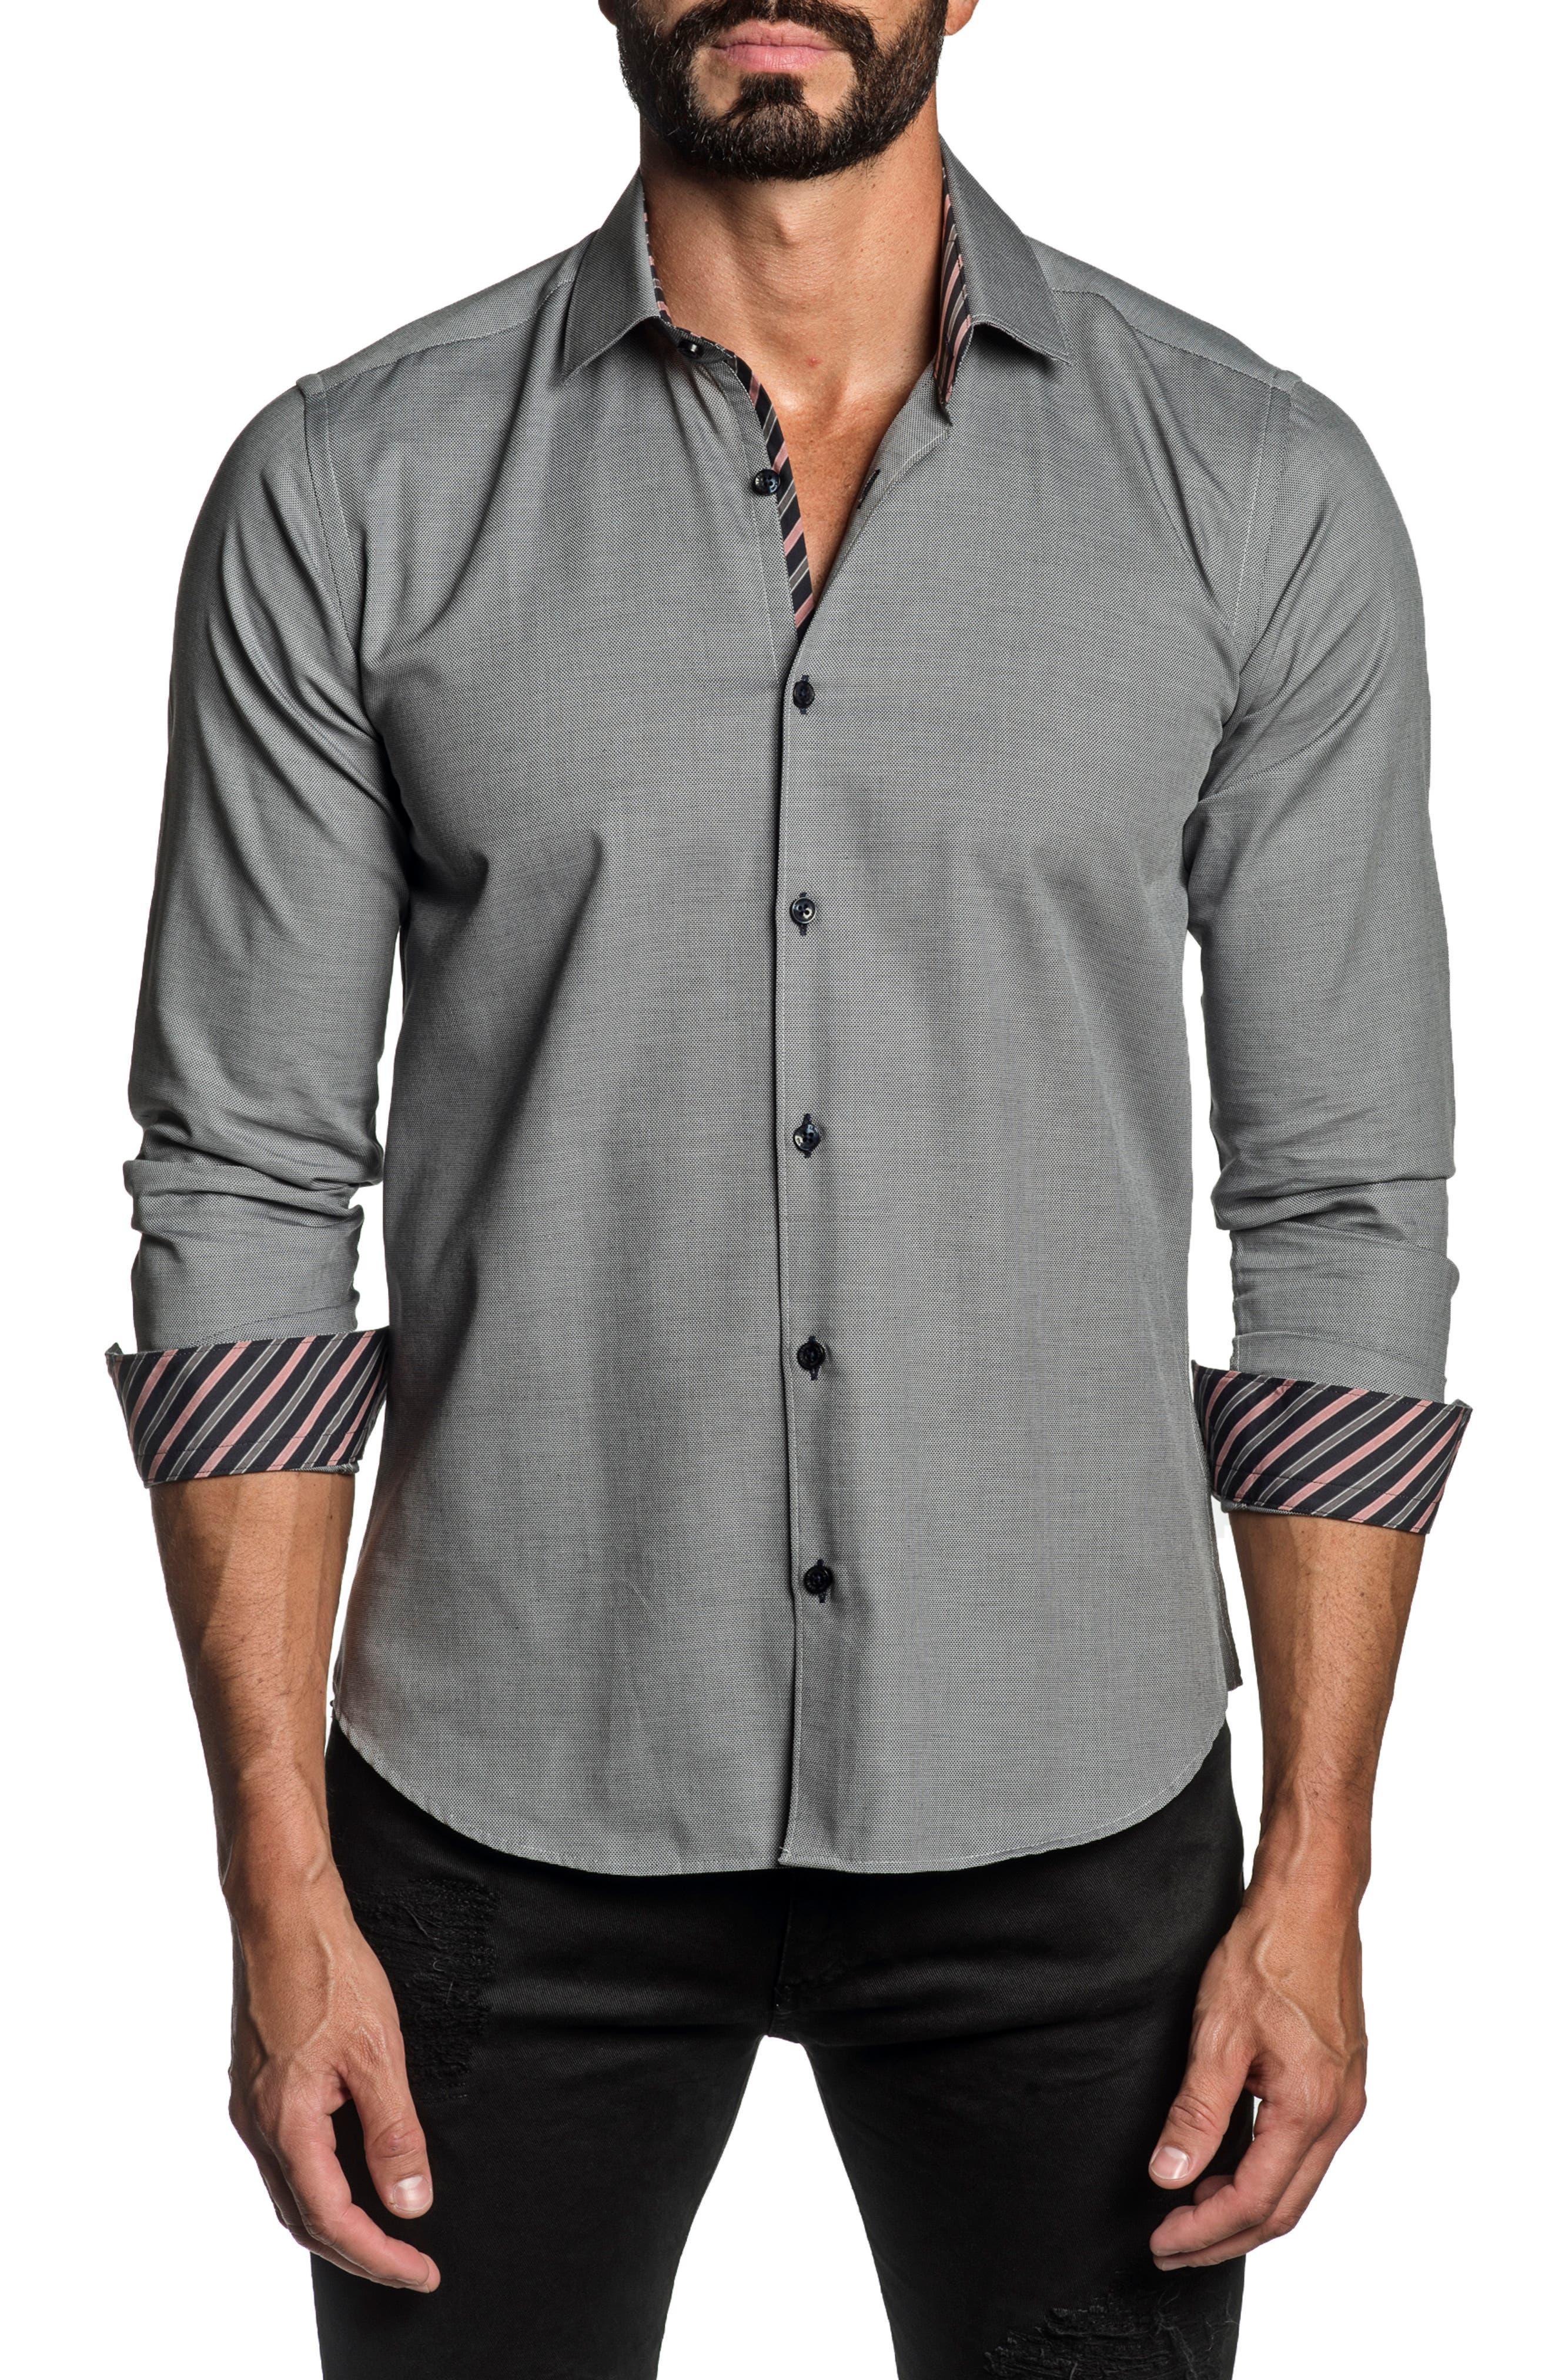 Regular Fit Solid Button-Up Shirt